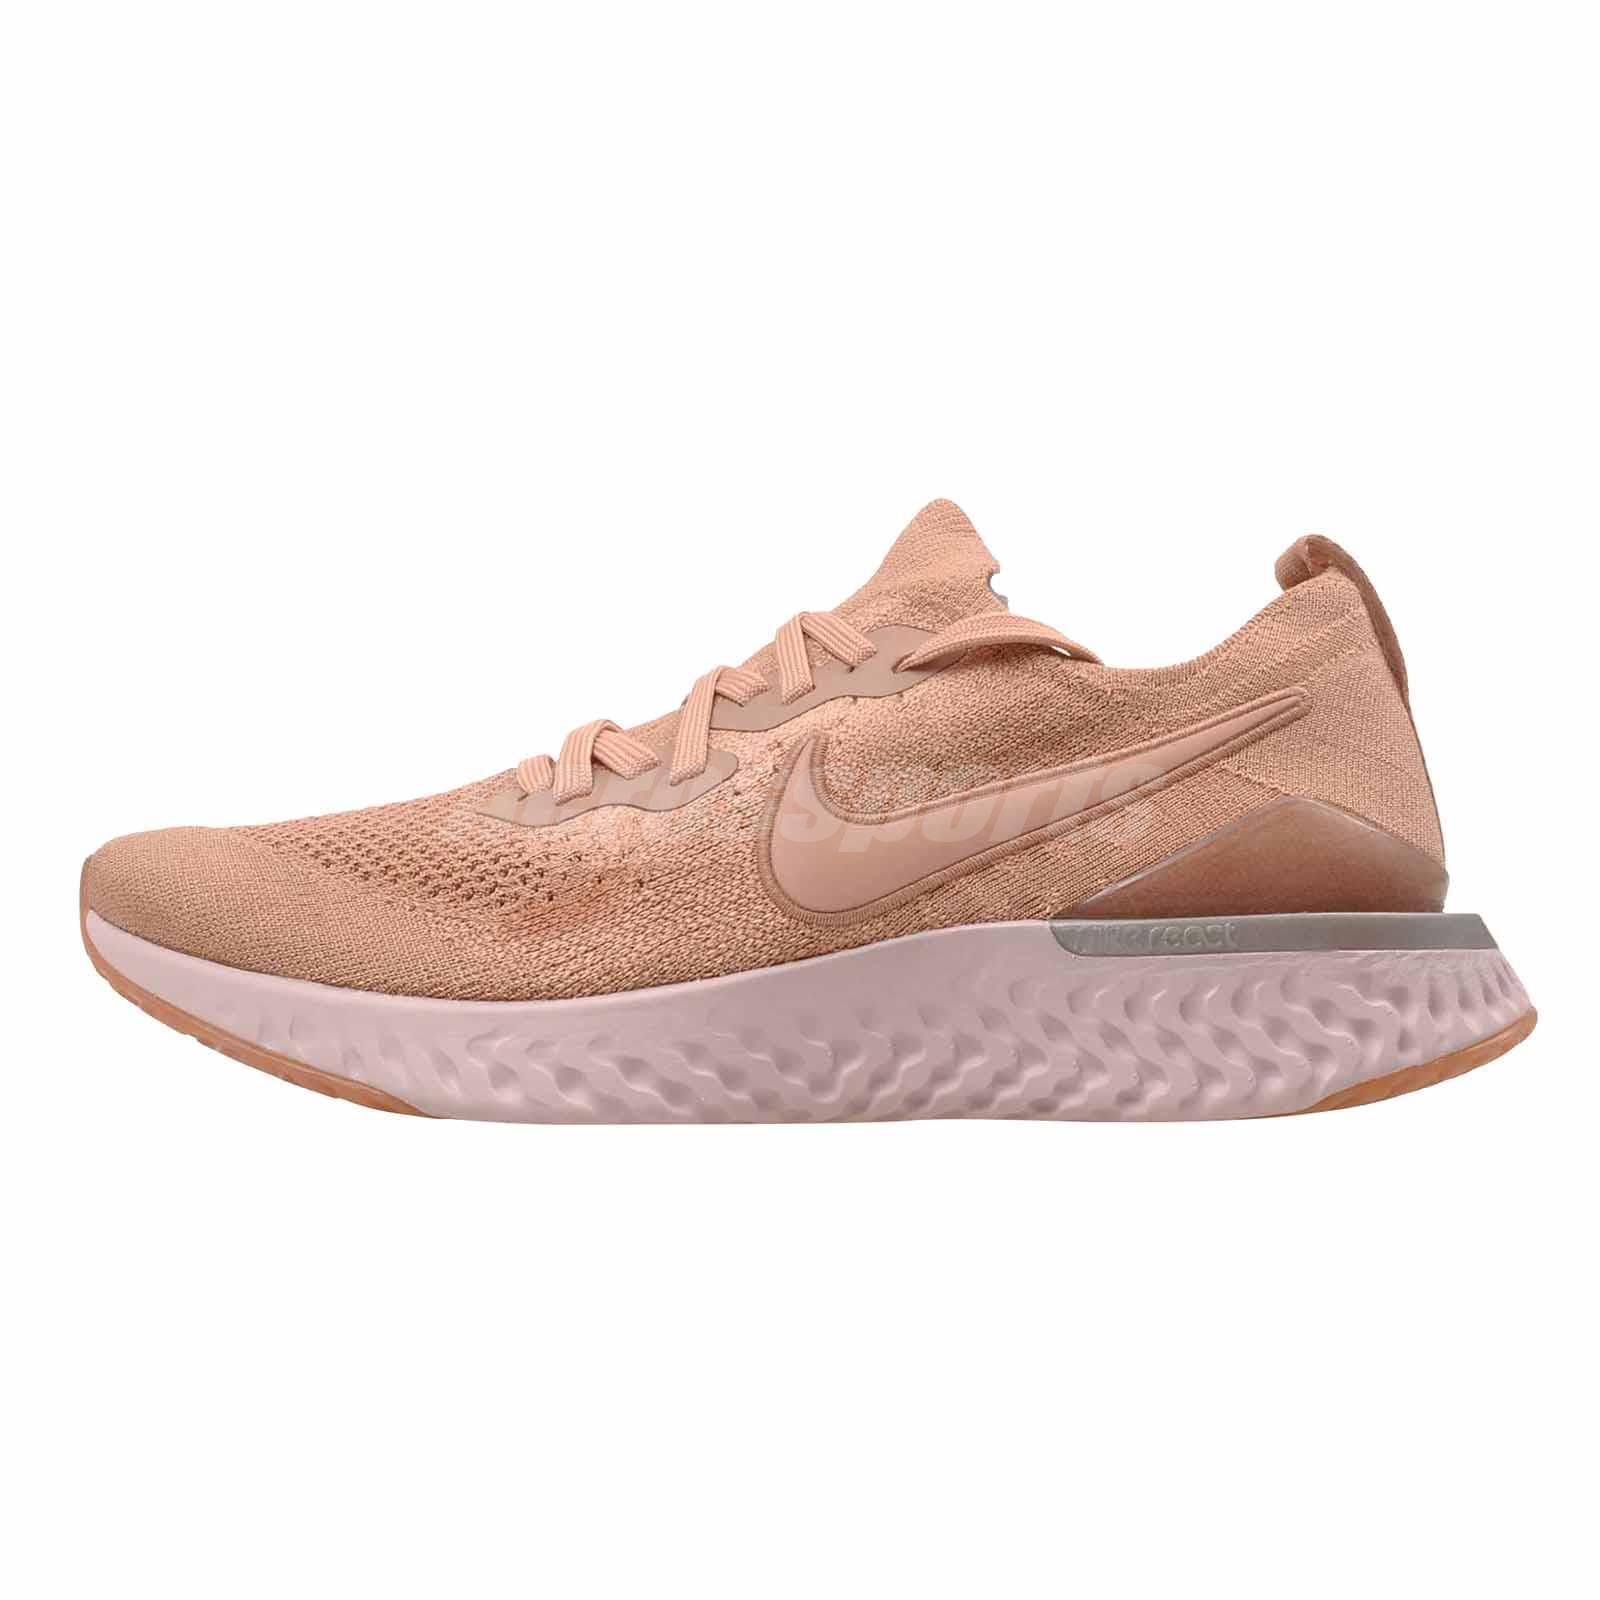 Running Mens Shoes Rose Gold BQ8928-600